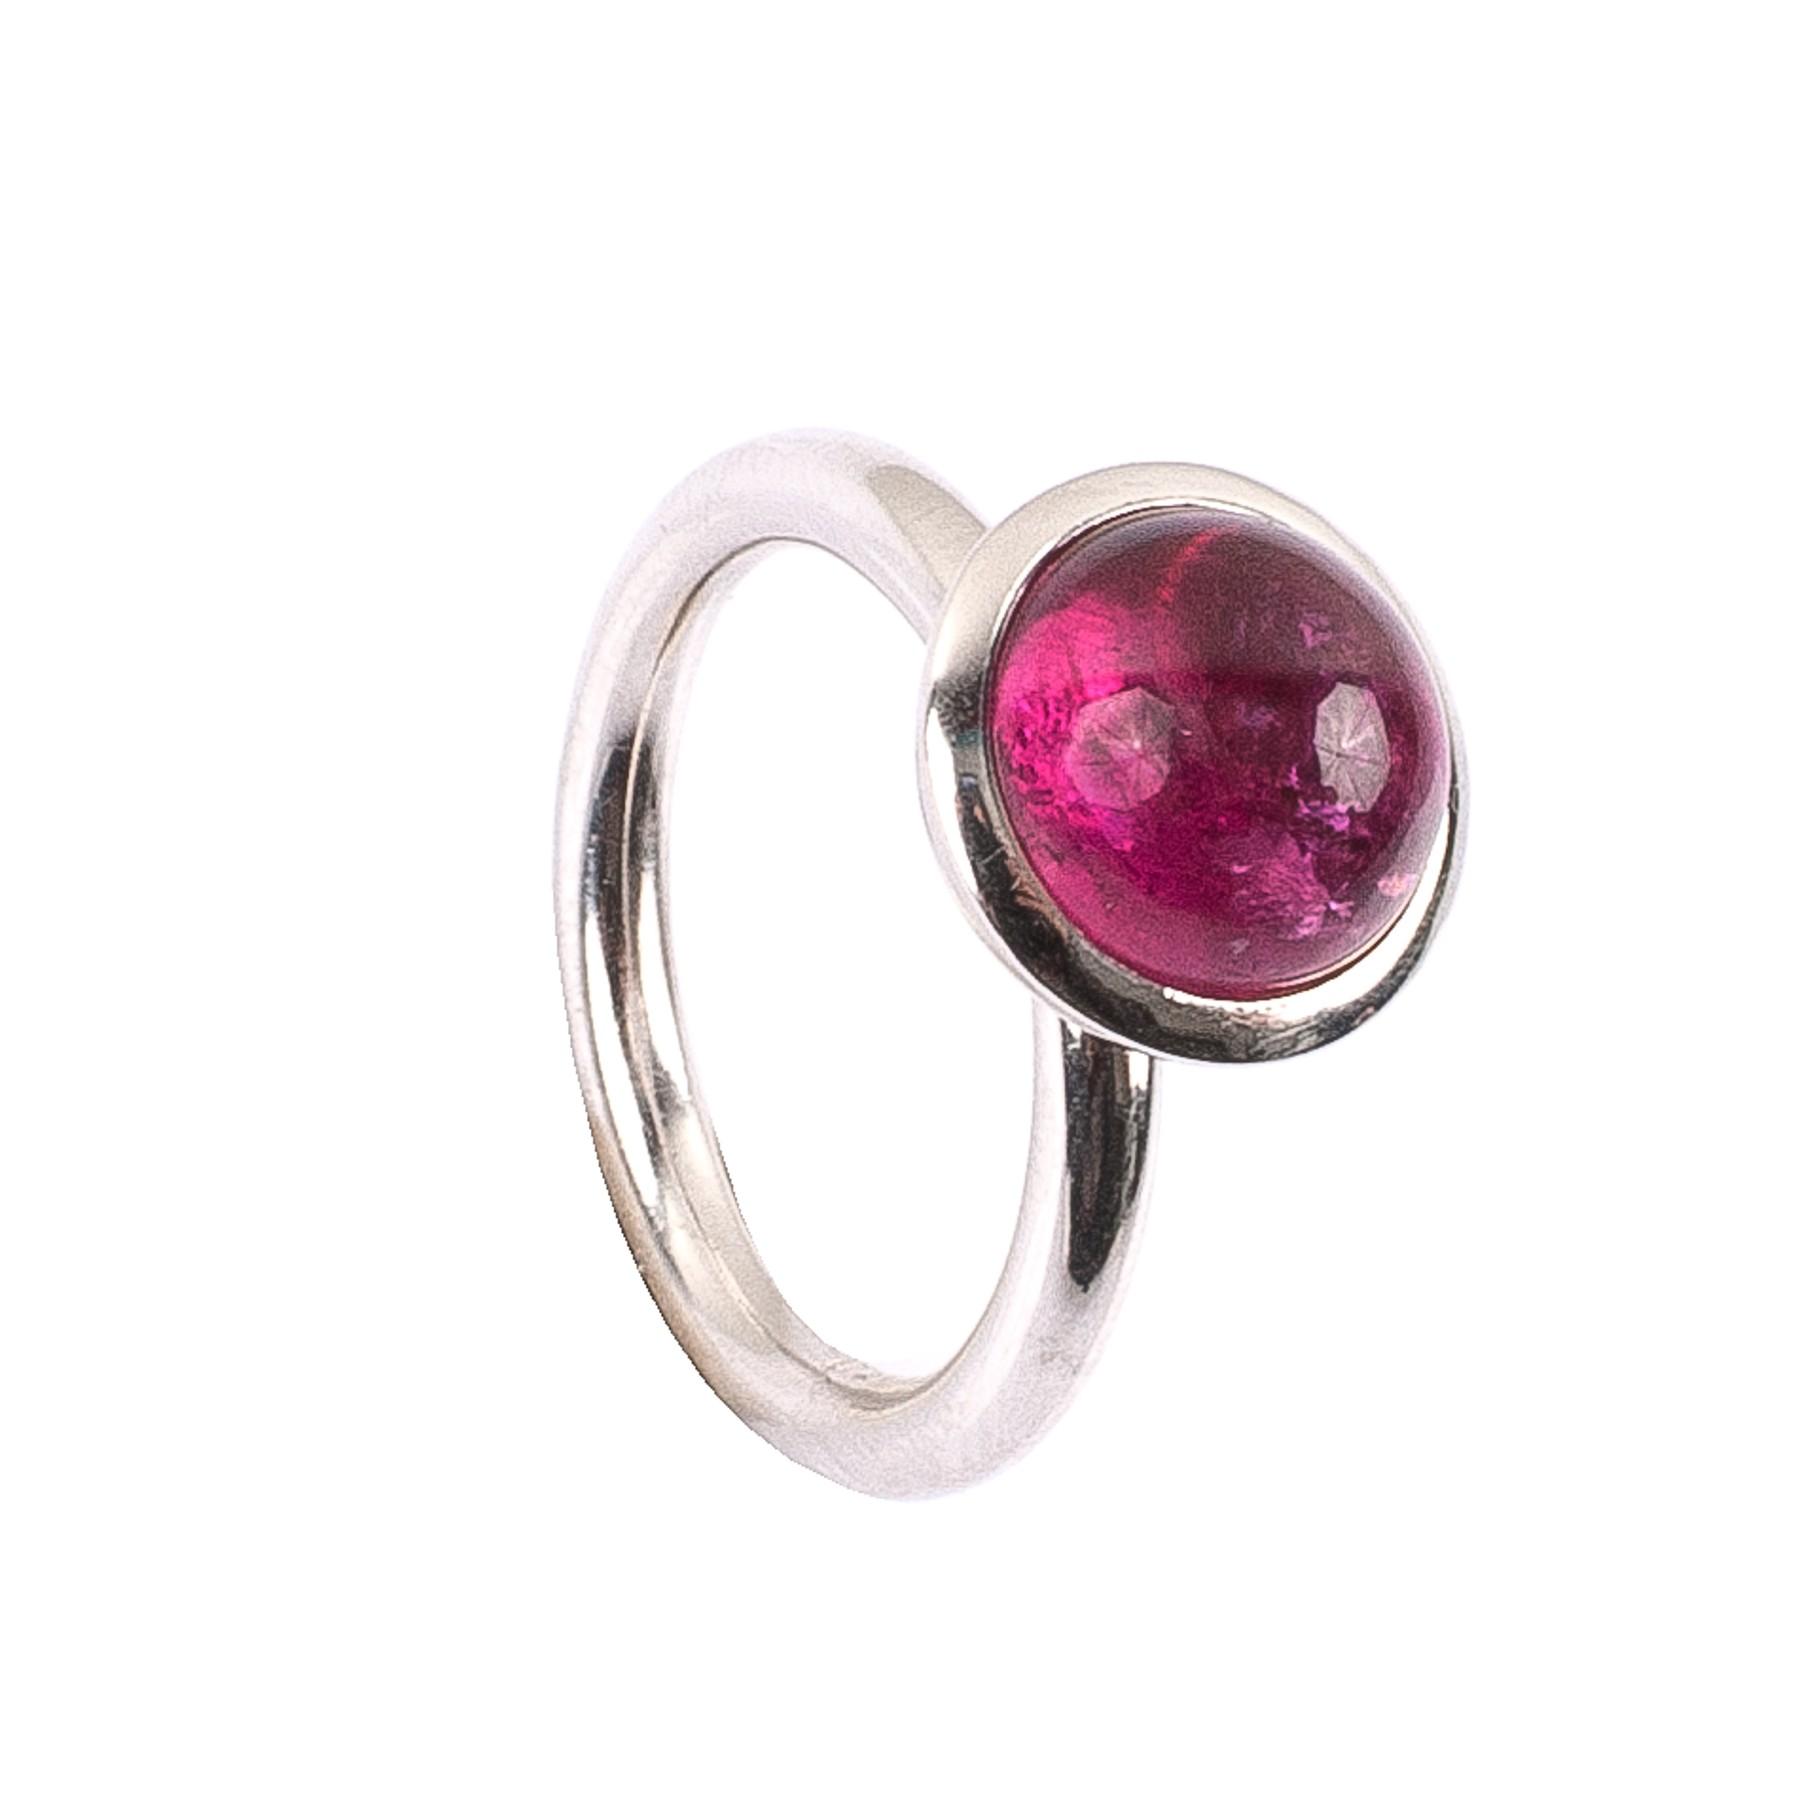 4,33CT Rubellit Turmalin Kuppel Ring